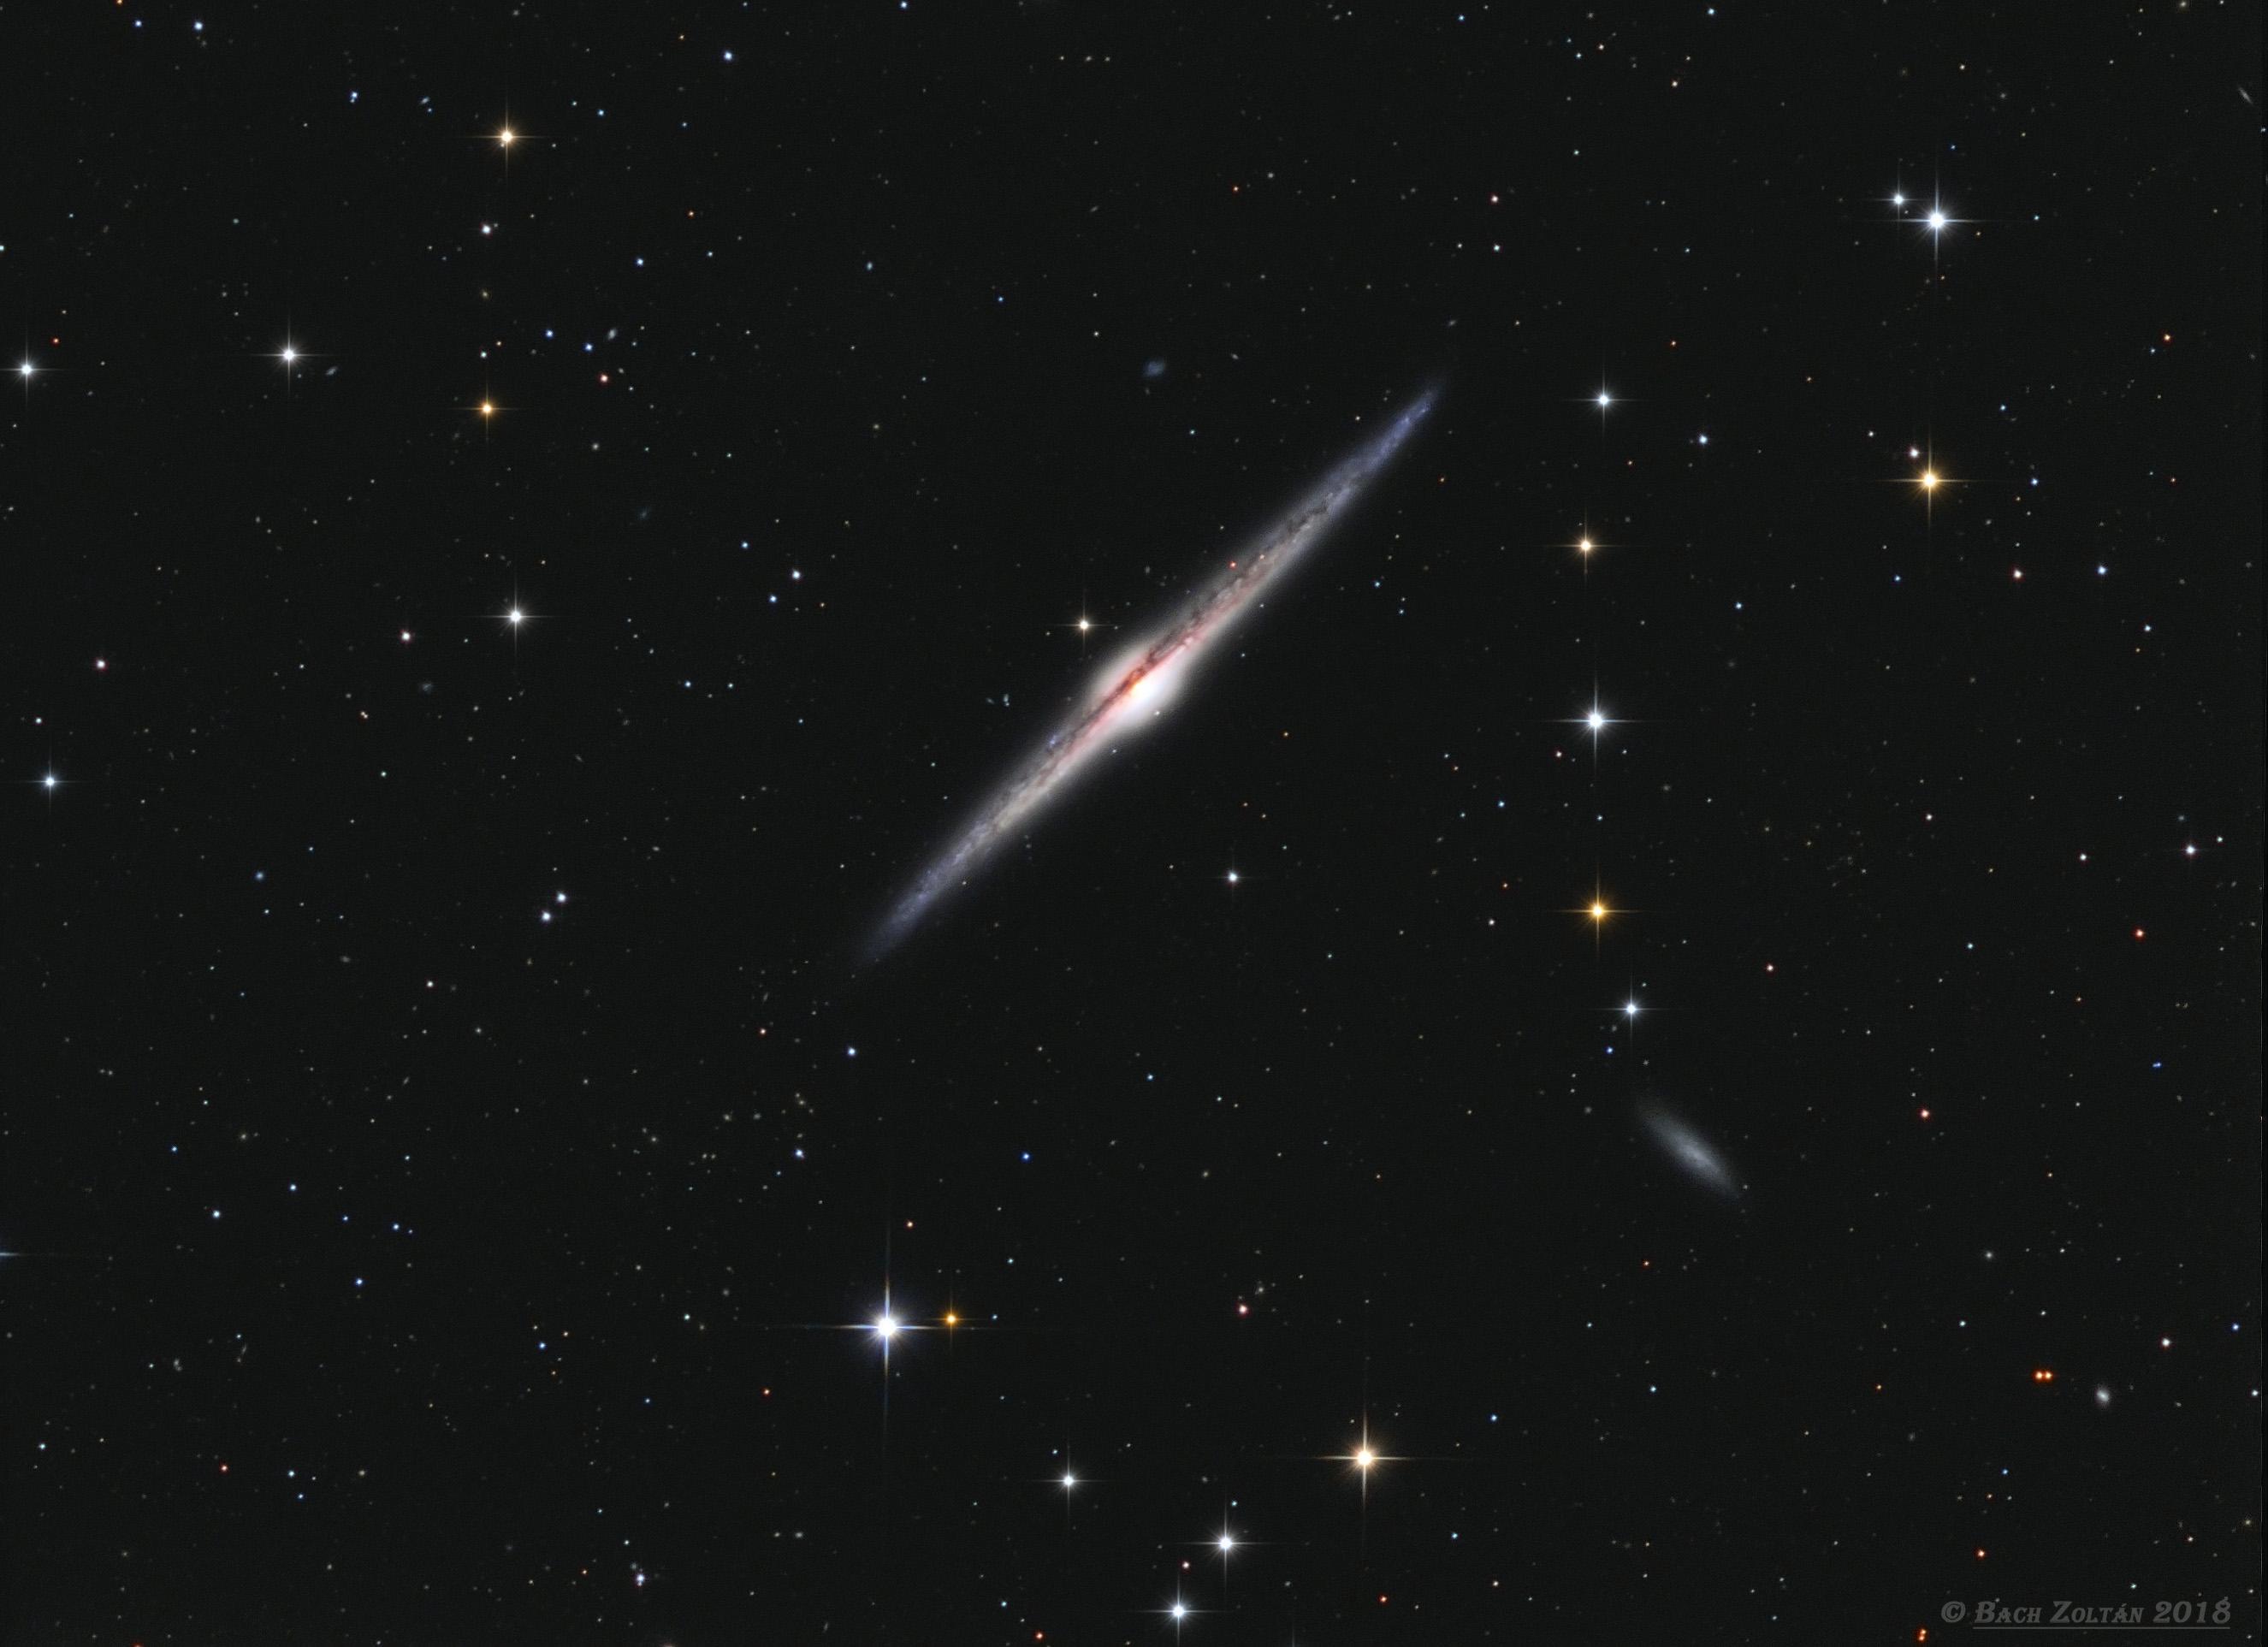 Tű galaxis